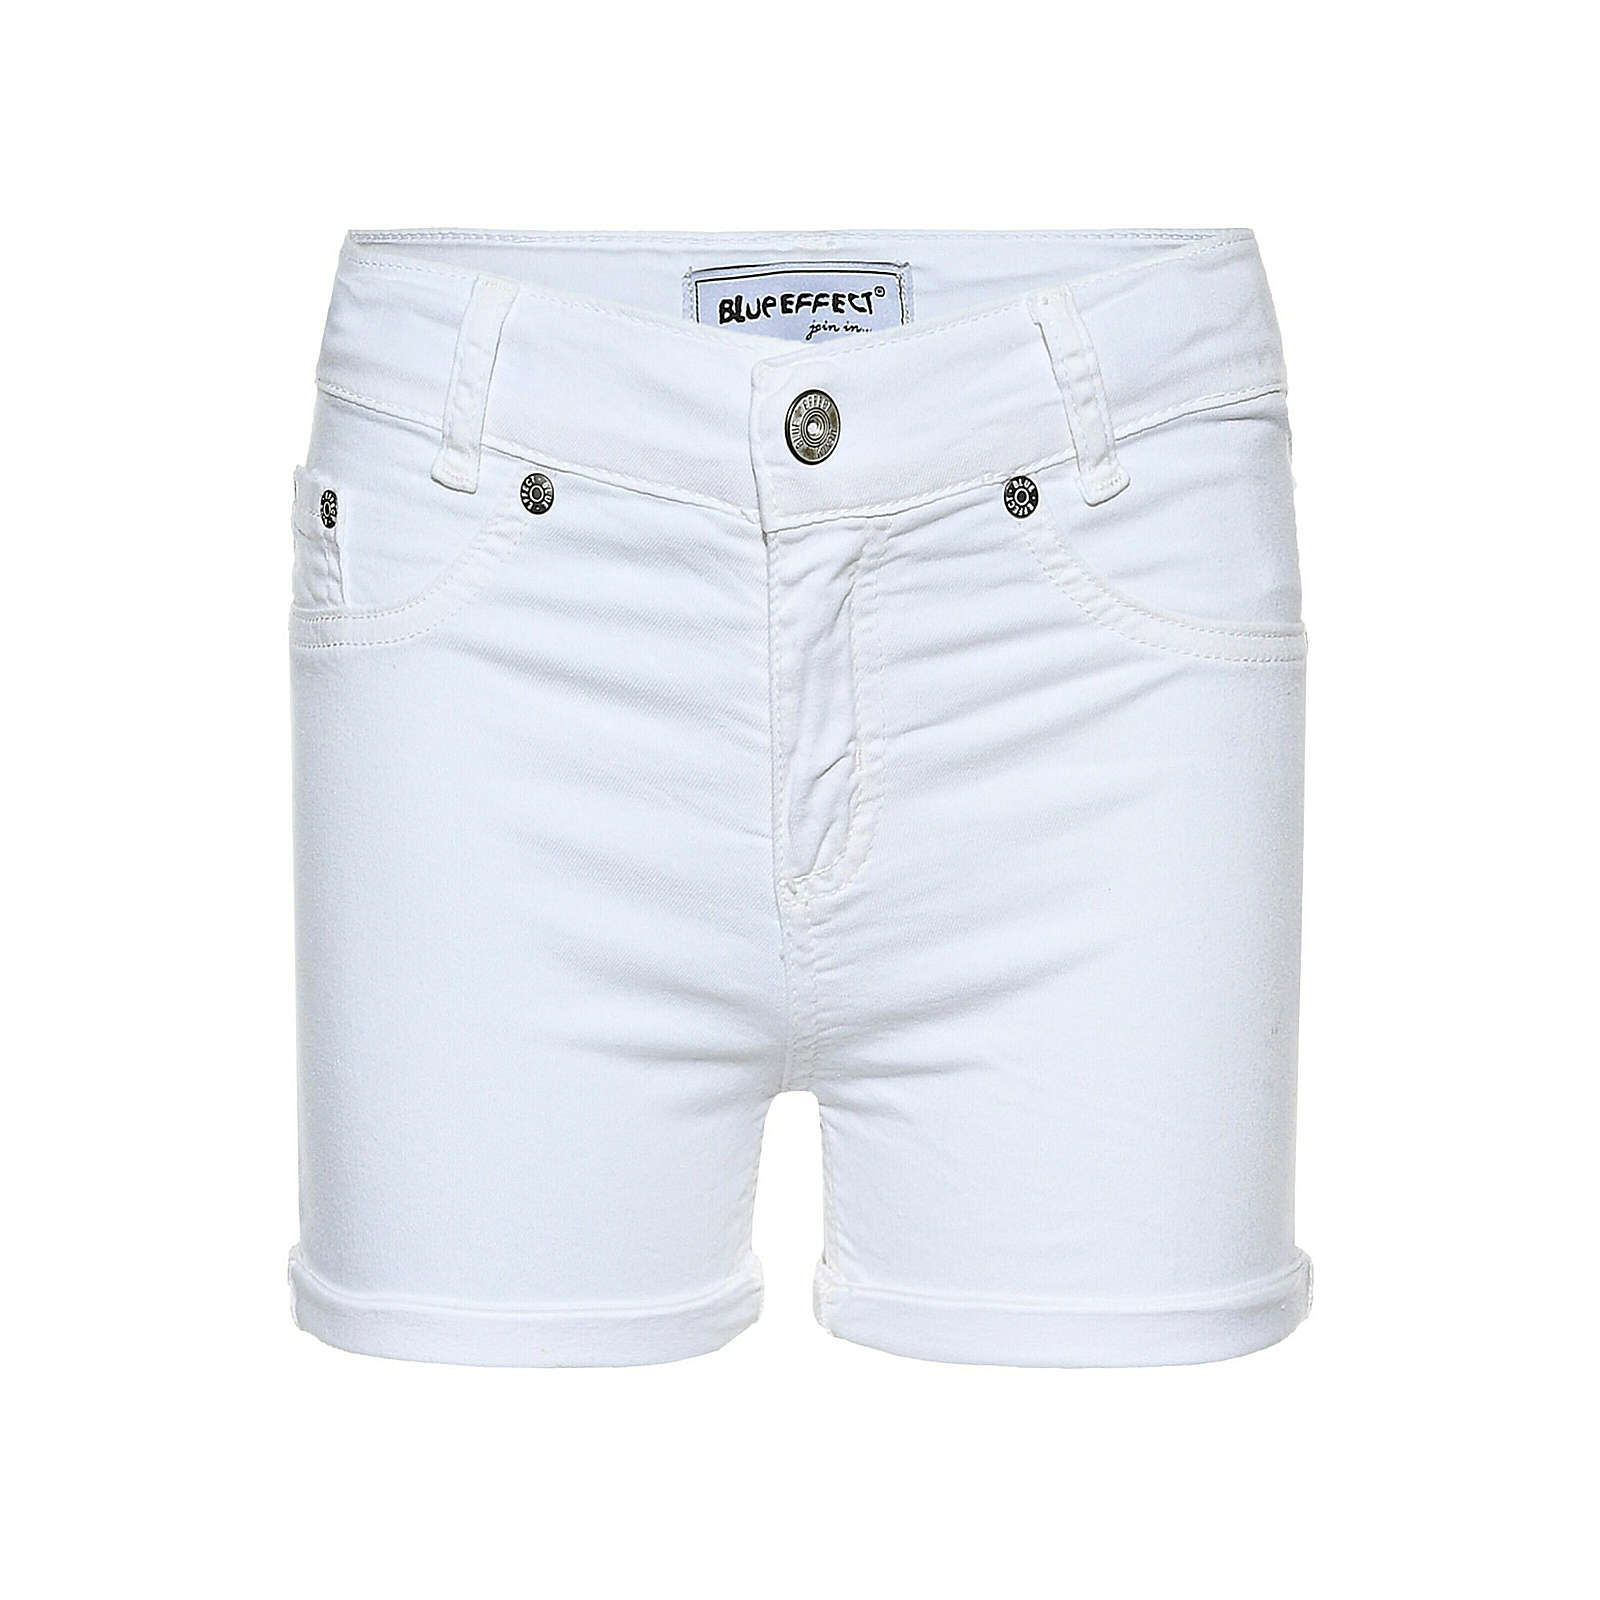 Blue EFFECT® BLUE EFFECT jeans Jeanshosen weiß Damen Gr. 146